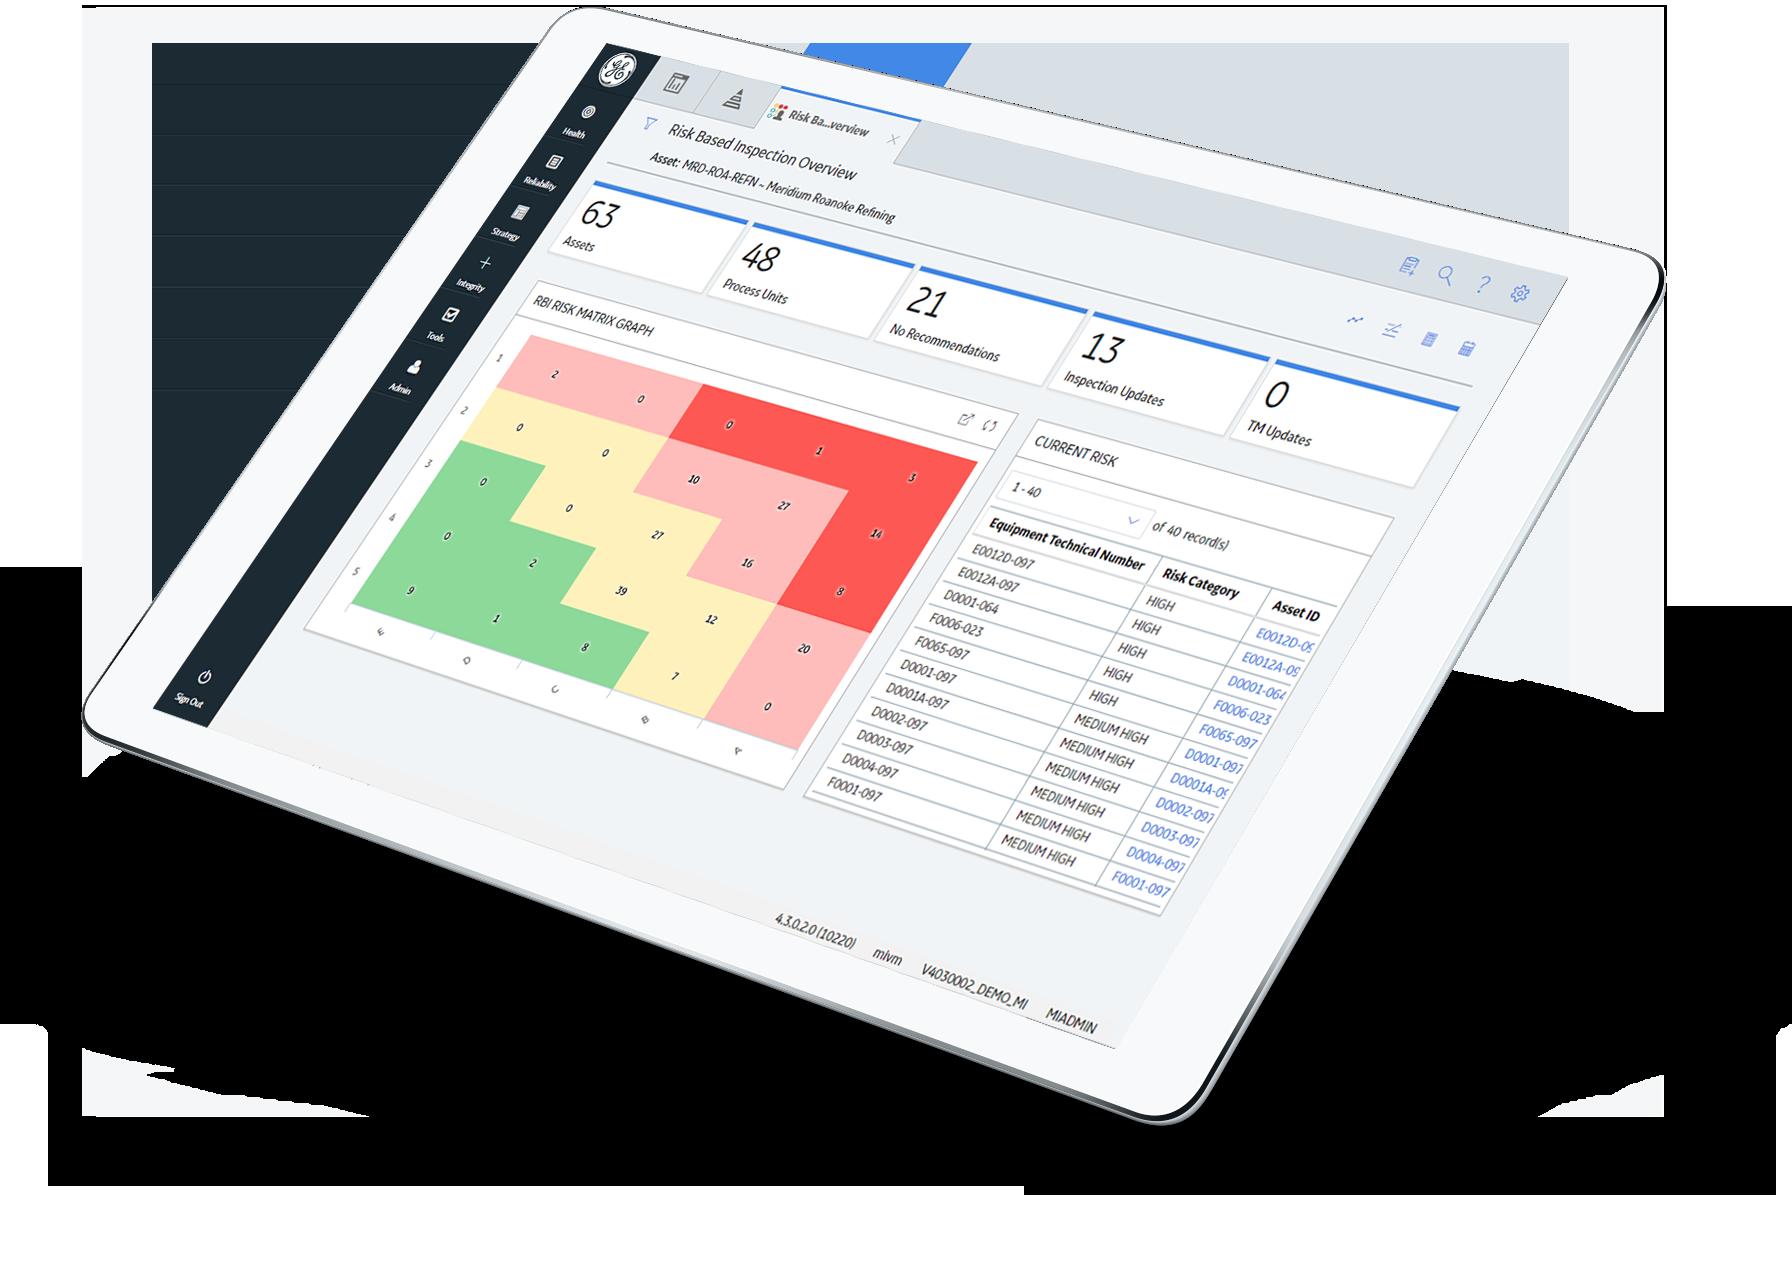 APM Integrity software from GE Digital, risk based inspection screenshot